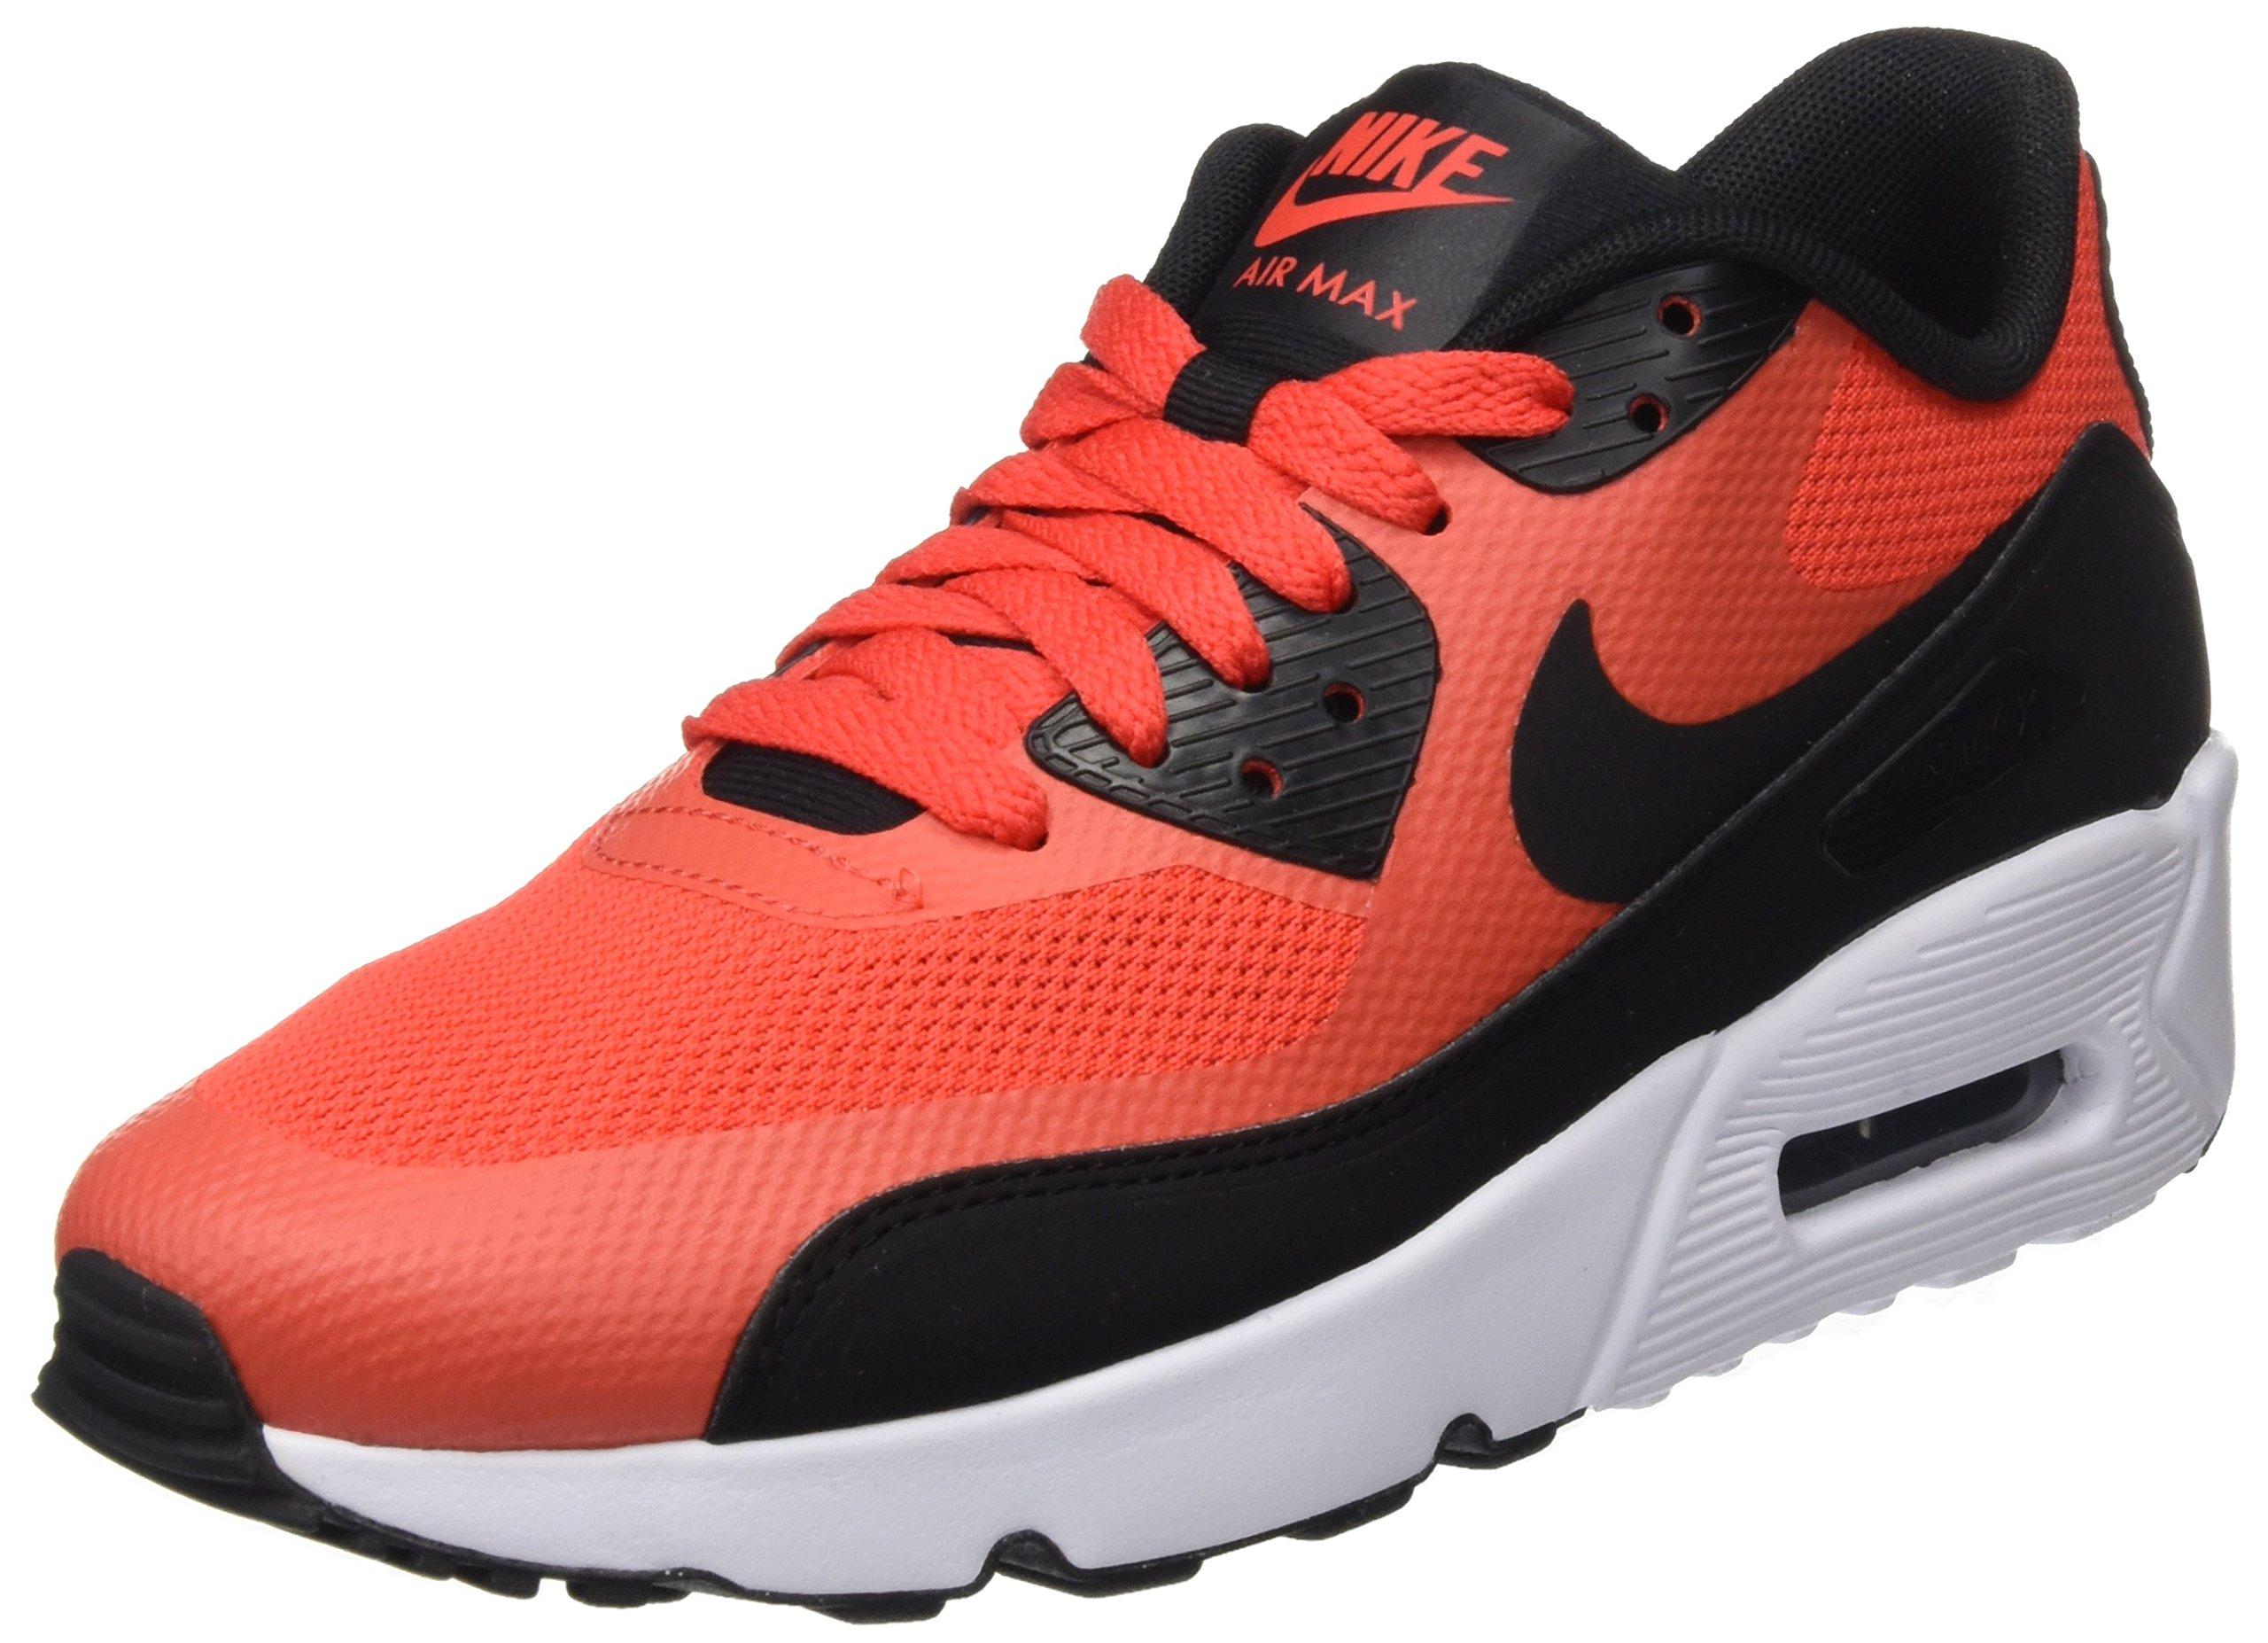 7ce42dd7eb Galleon - NIKE Kids Air Max 90 Ultra 2.0 (GS) Max Orange/Black/White  Running Shoe 4.5 Kids US